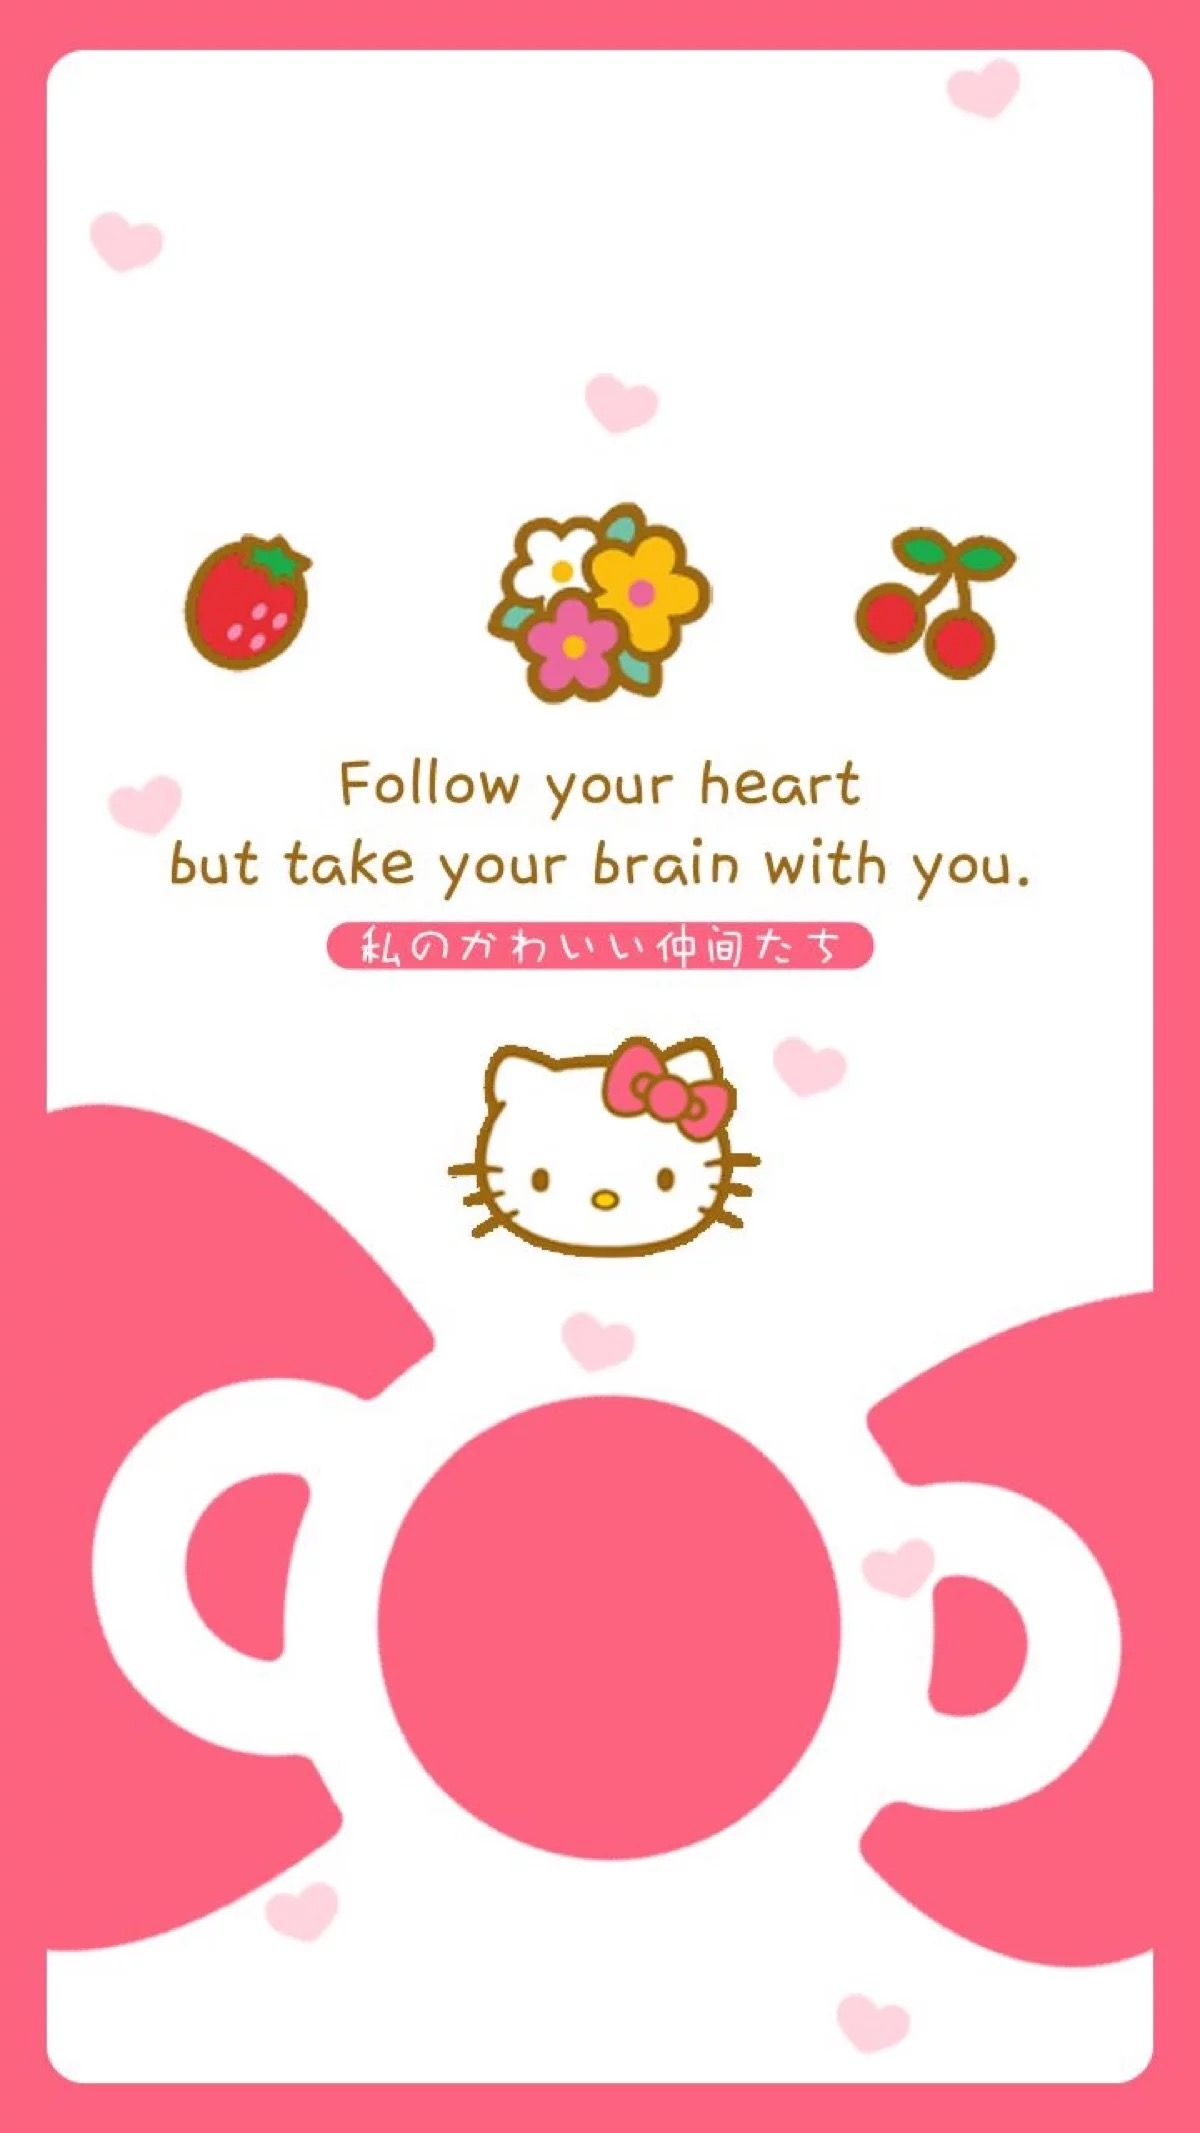 Great Wallpaper Hello Kitty Kawaii - 7bf995bf34930773849e01692a066459  Perfect Image Reference_283681.jpg